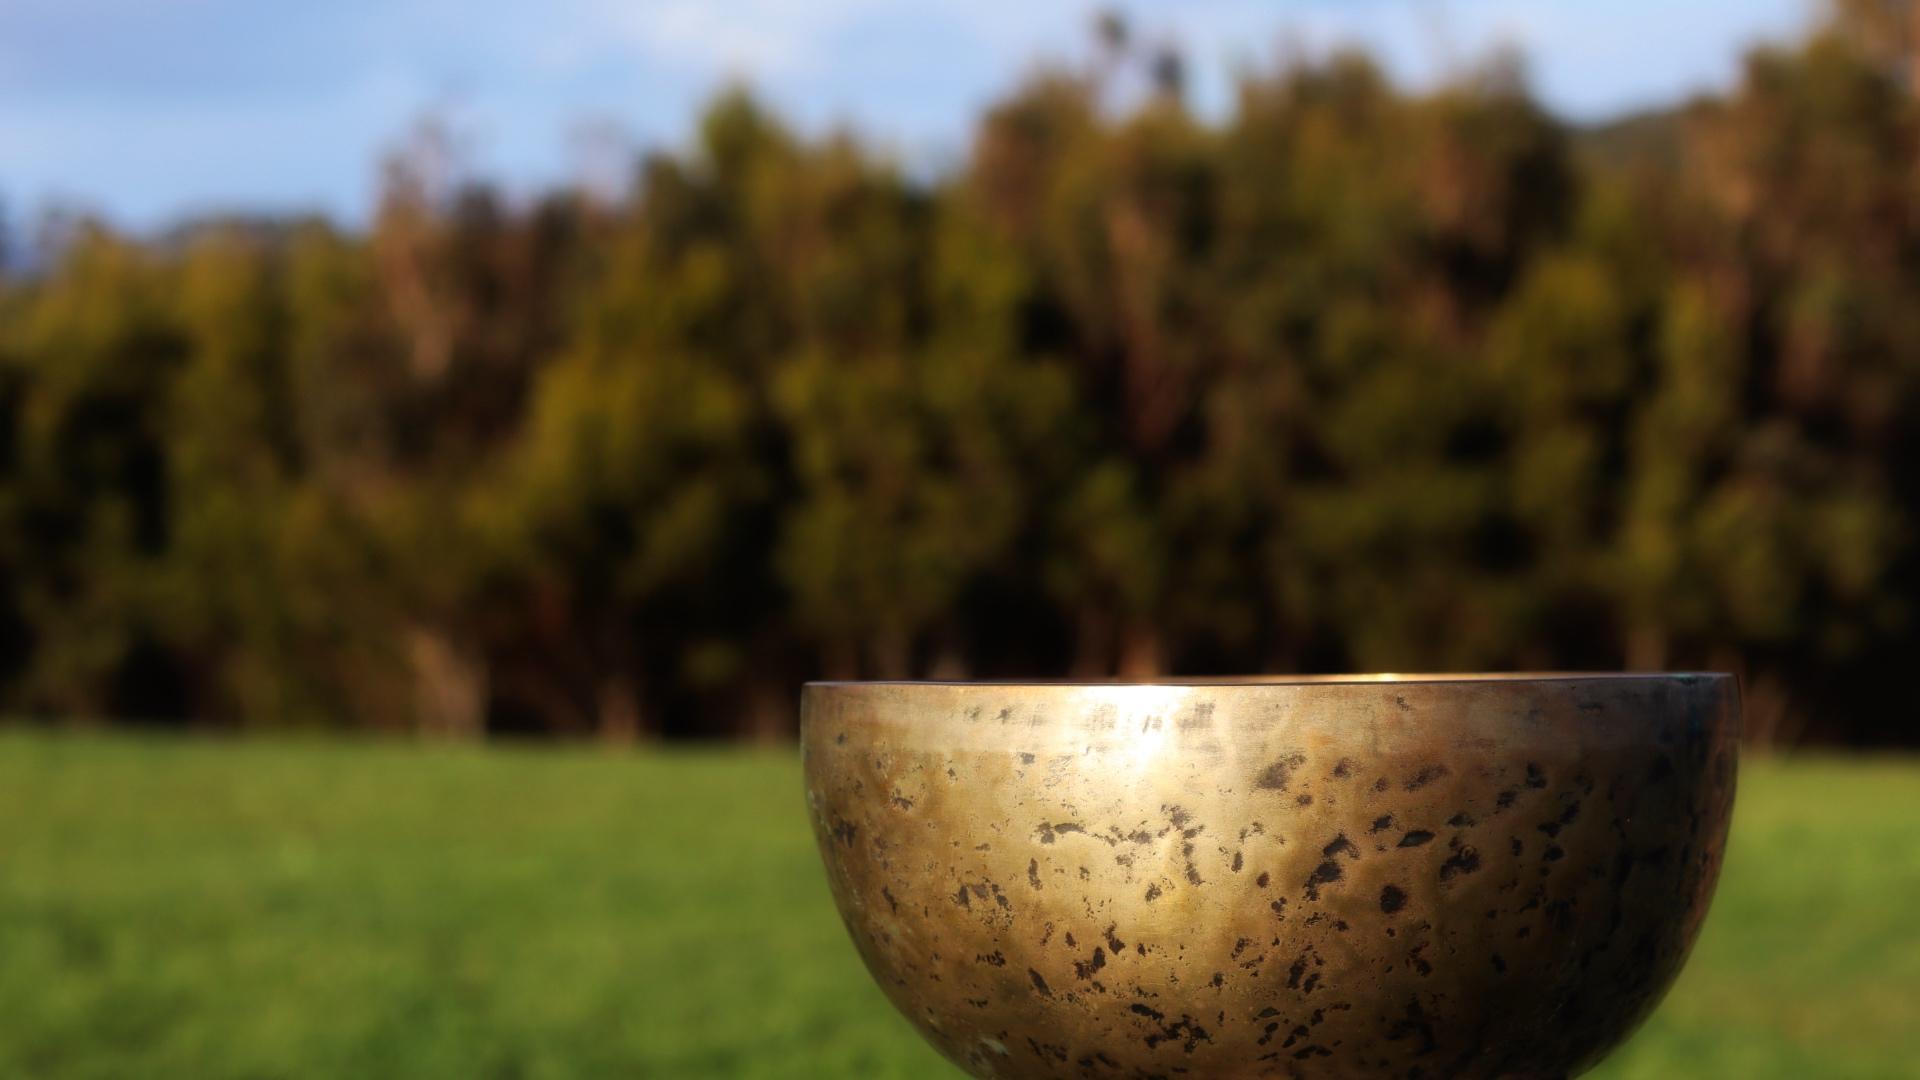 Tibetan Singing Bowl in the Garden